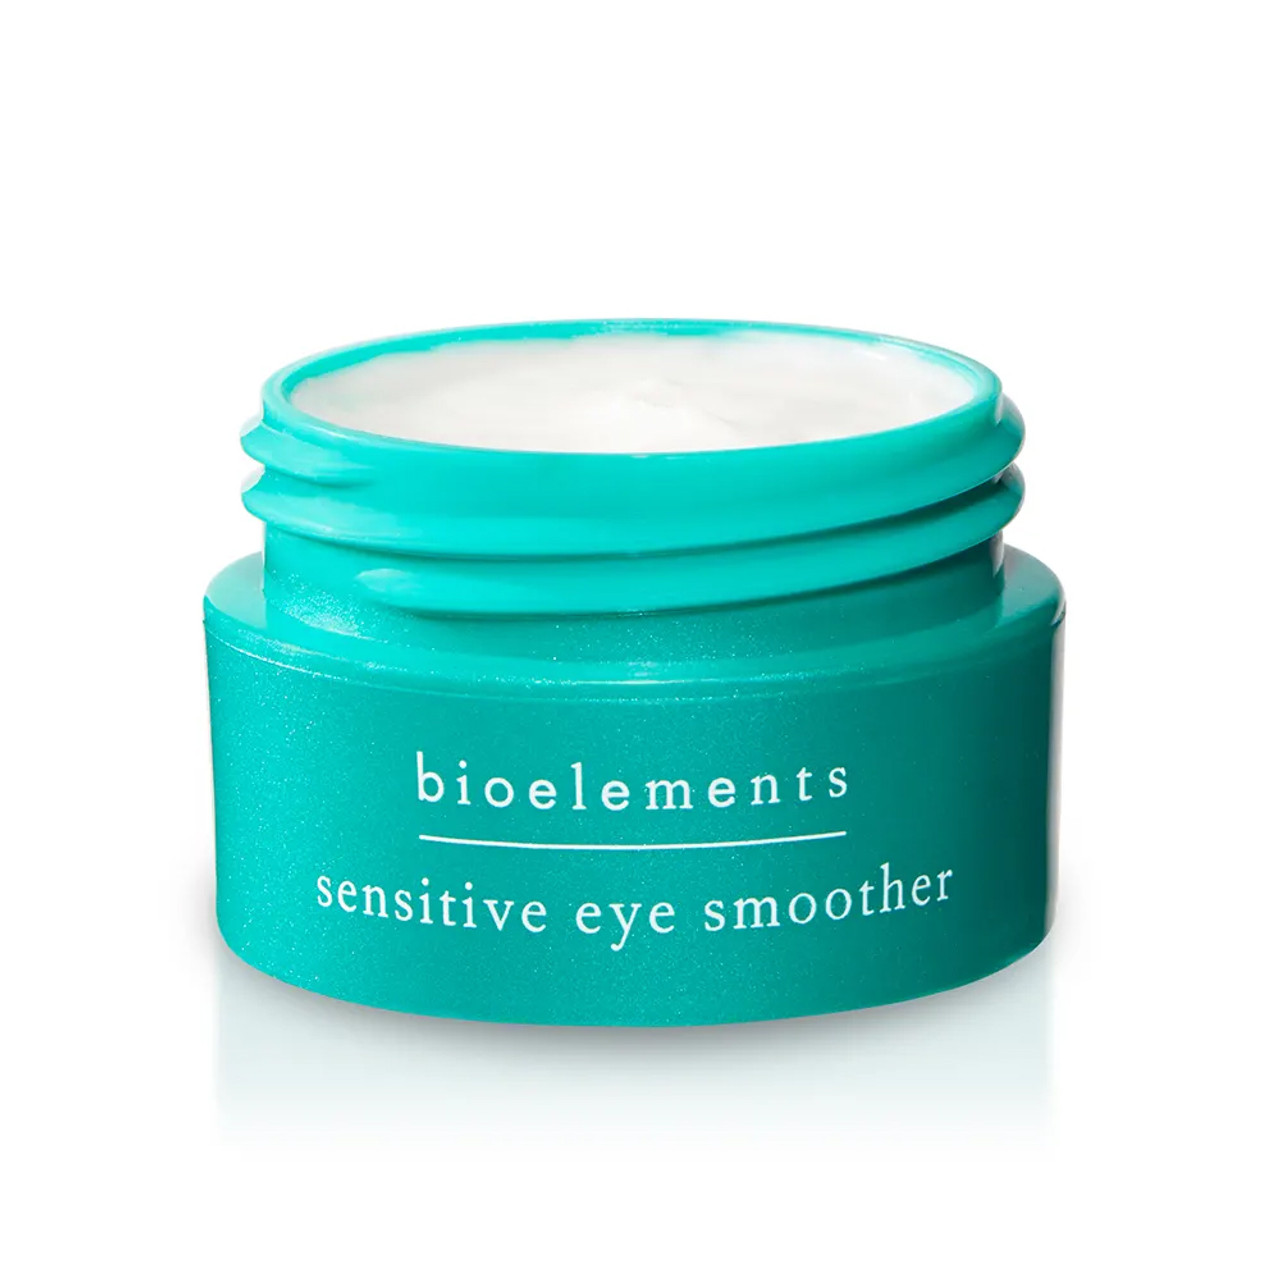 Bioelements Sensitive Eye Smoother